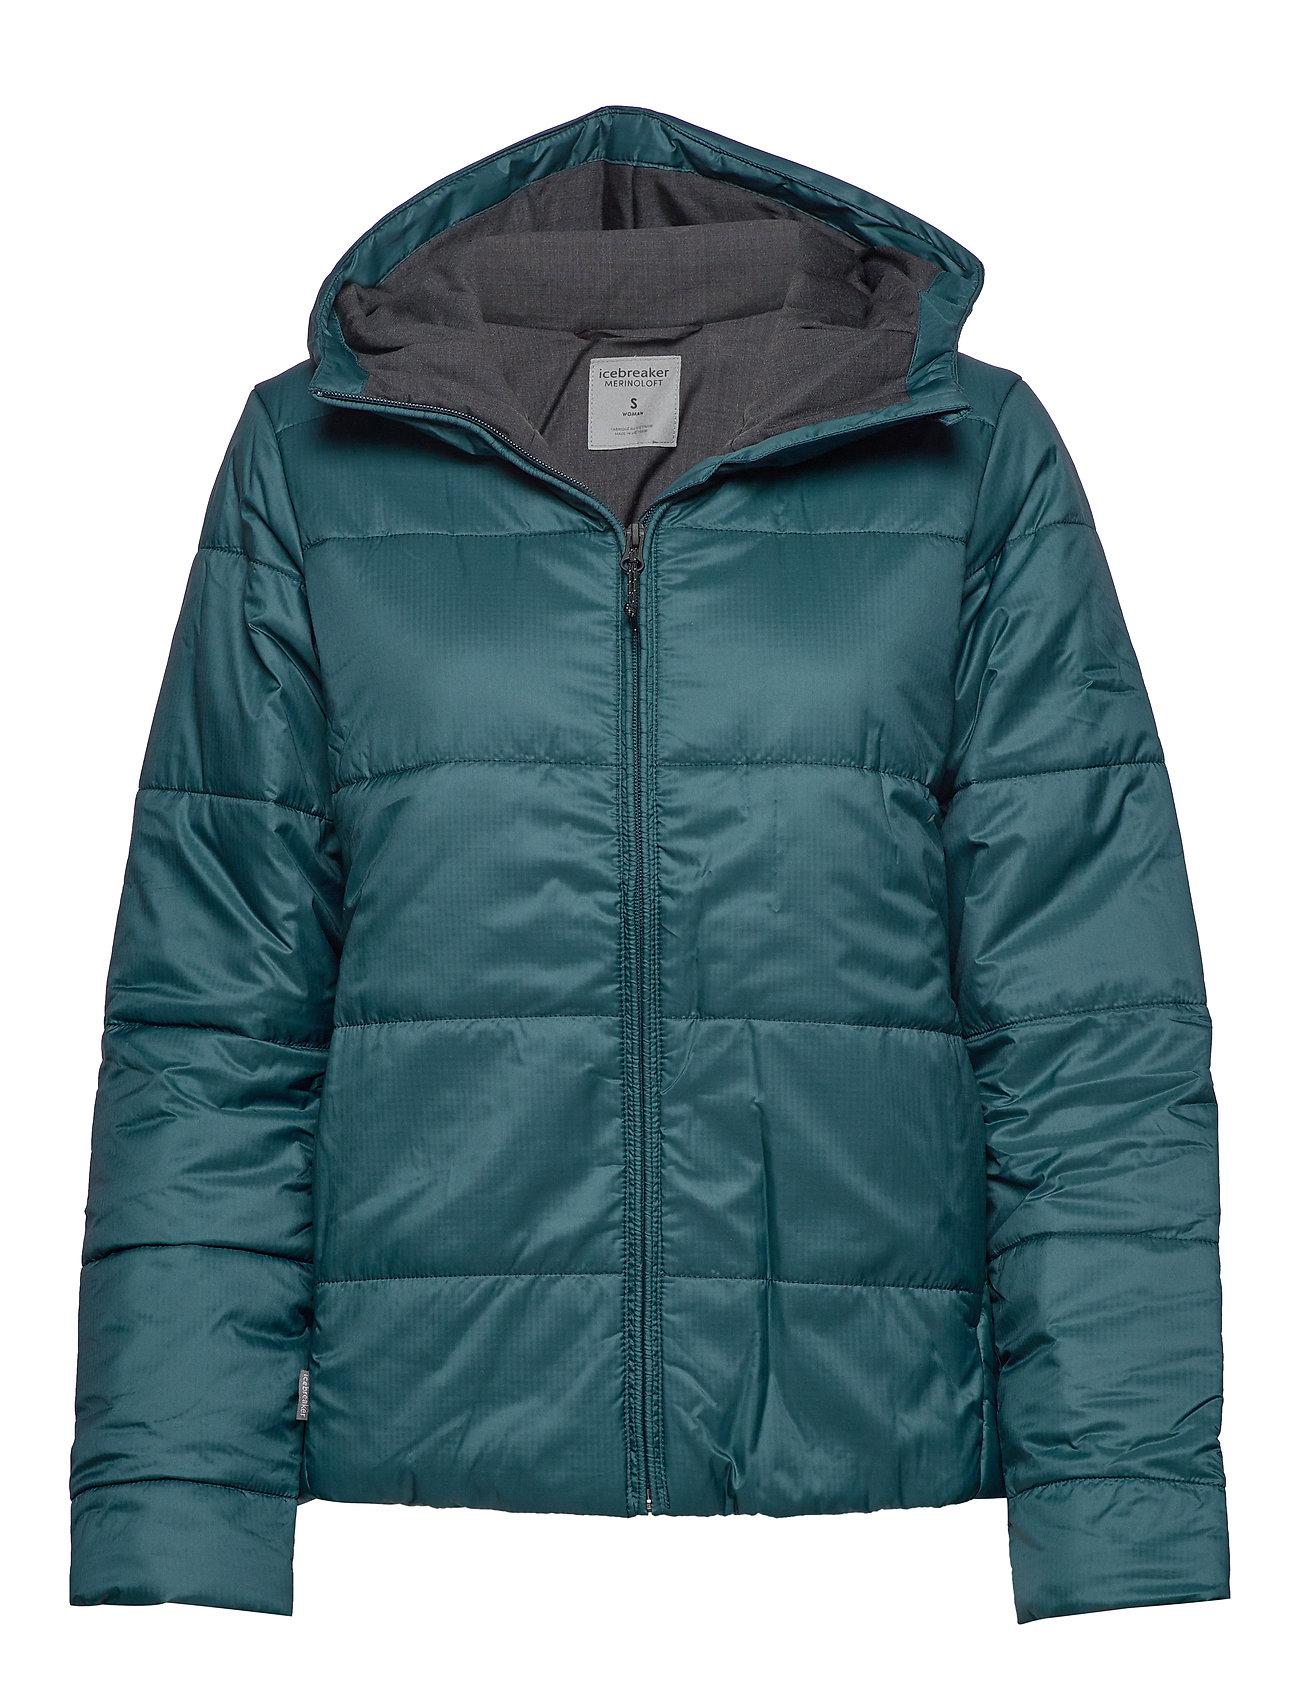 Icebreaker Wmns Collingwood Hooded Jacket - NIGHTFALL